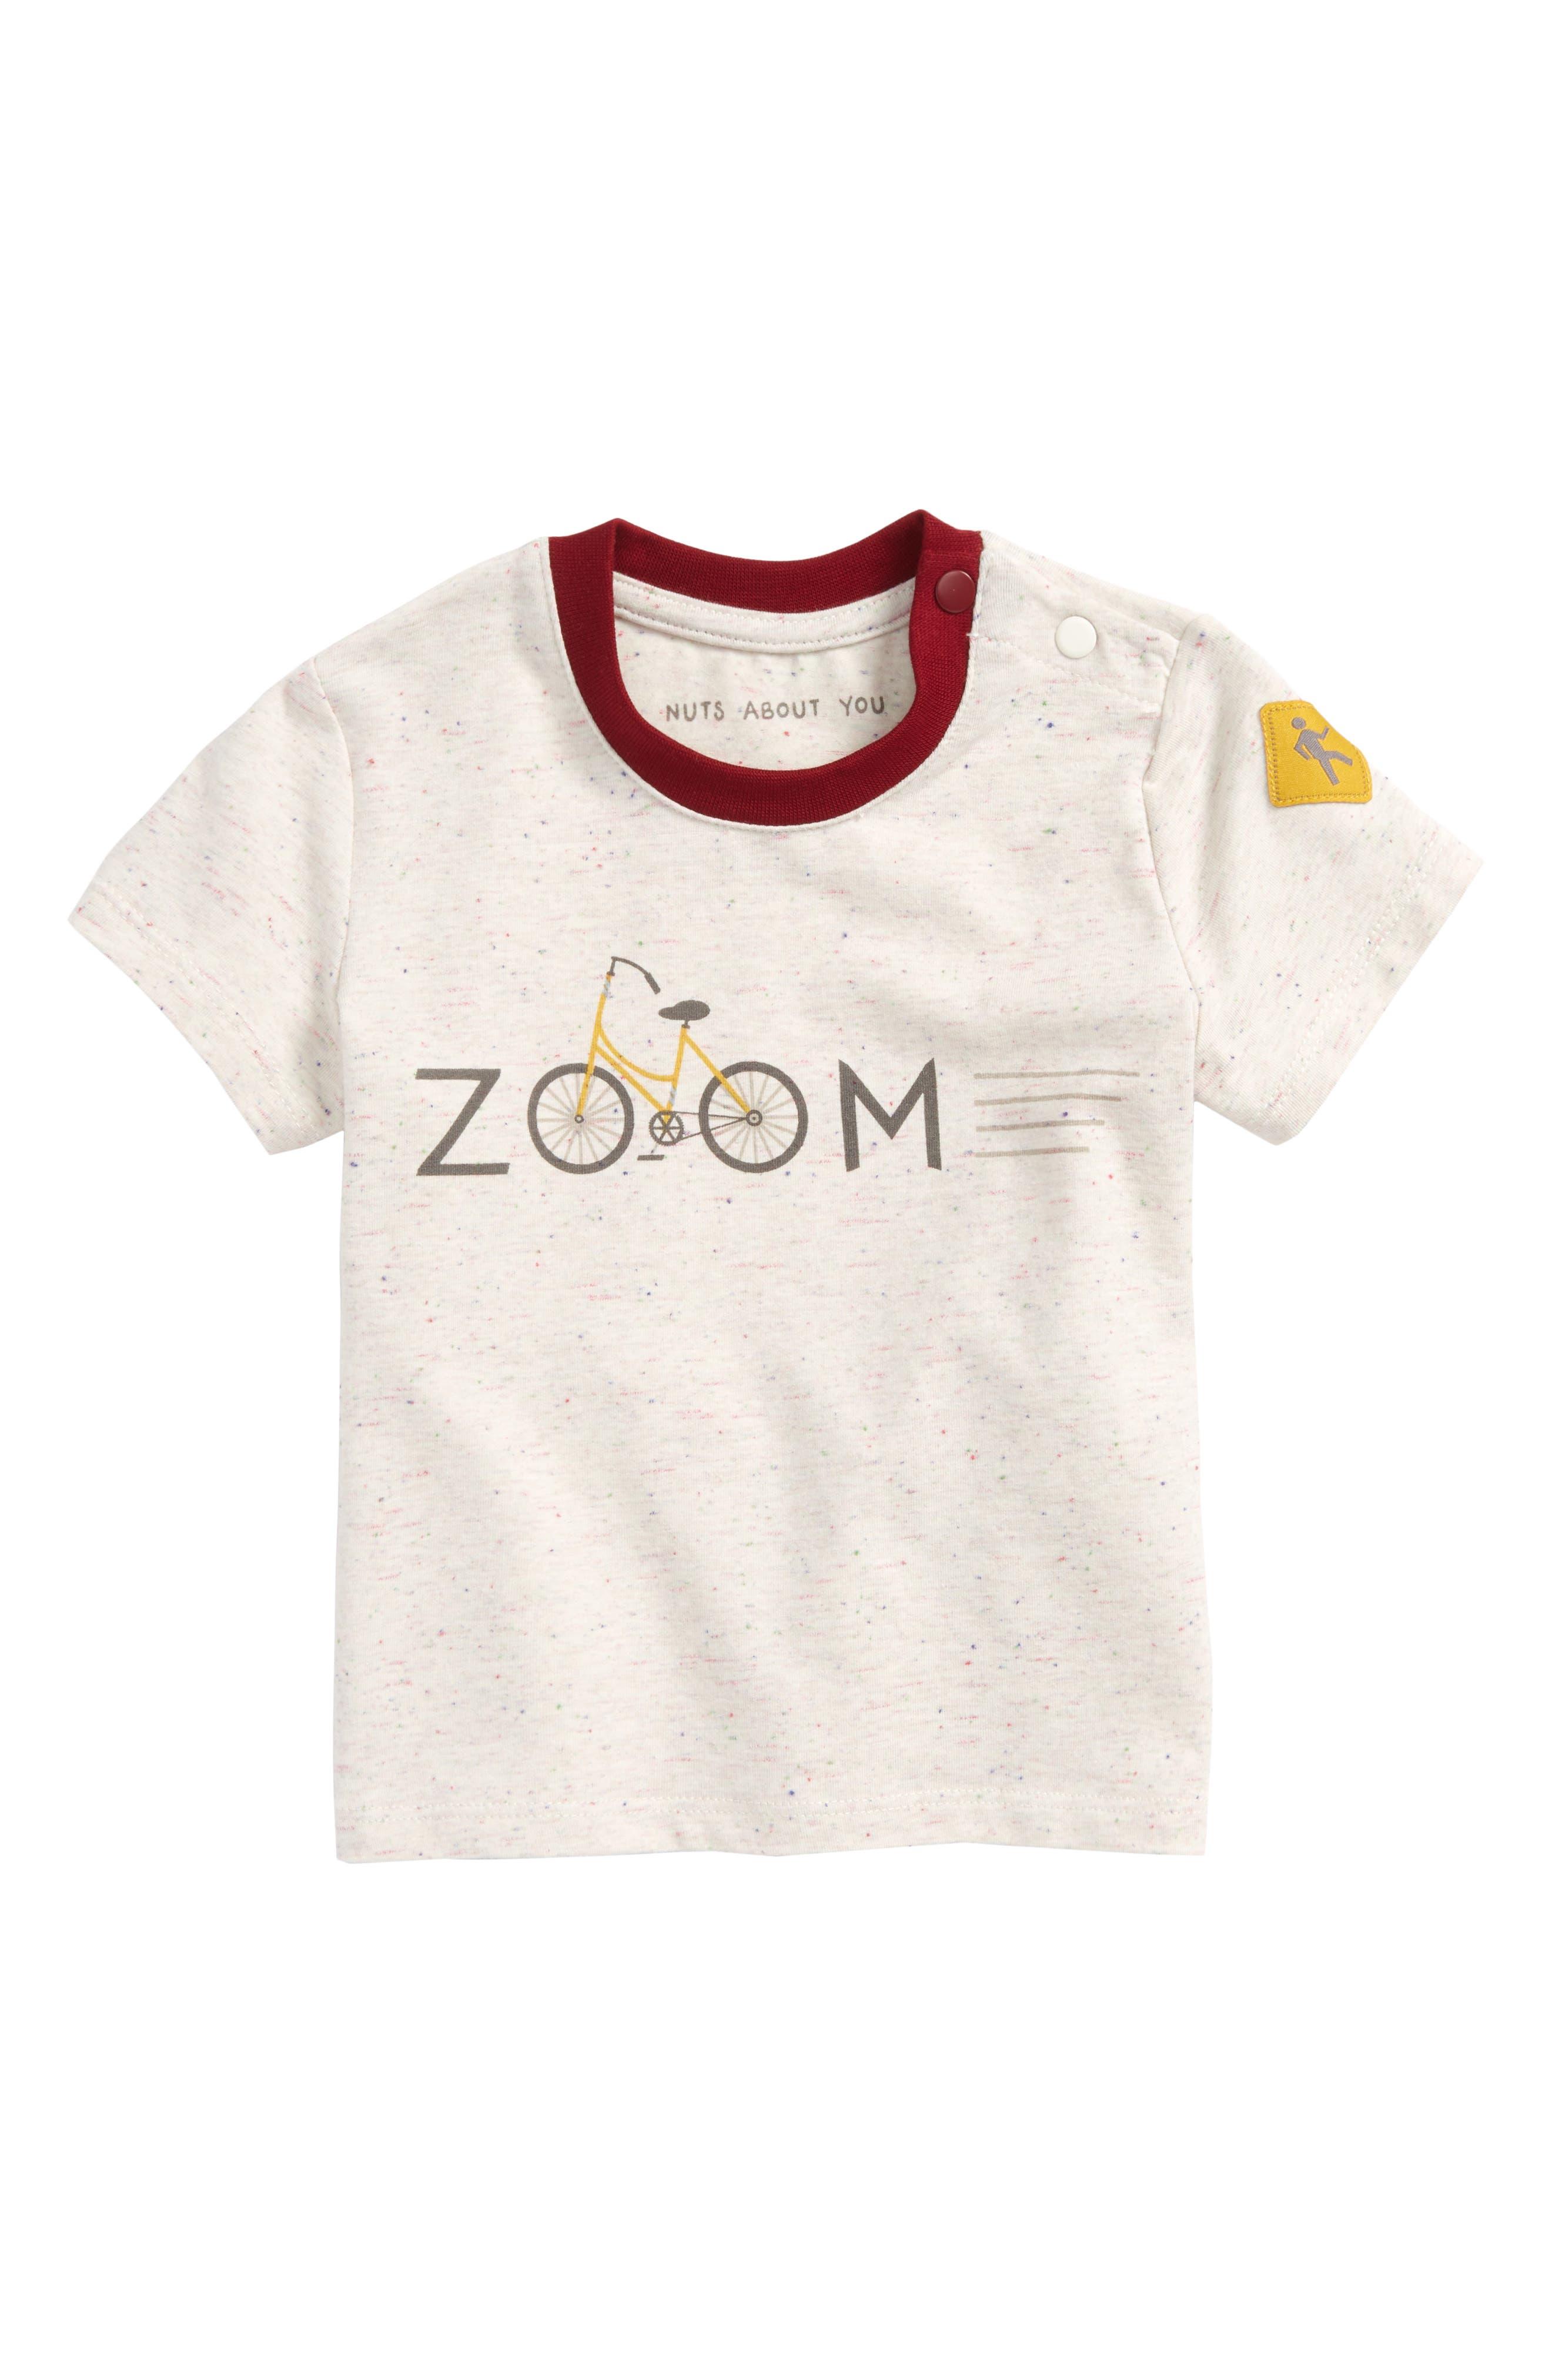 Zoom Graphic T-Shirt,                             Main thumbnail 1, color,                             100